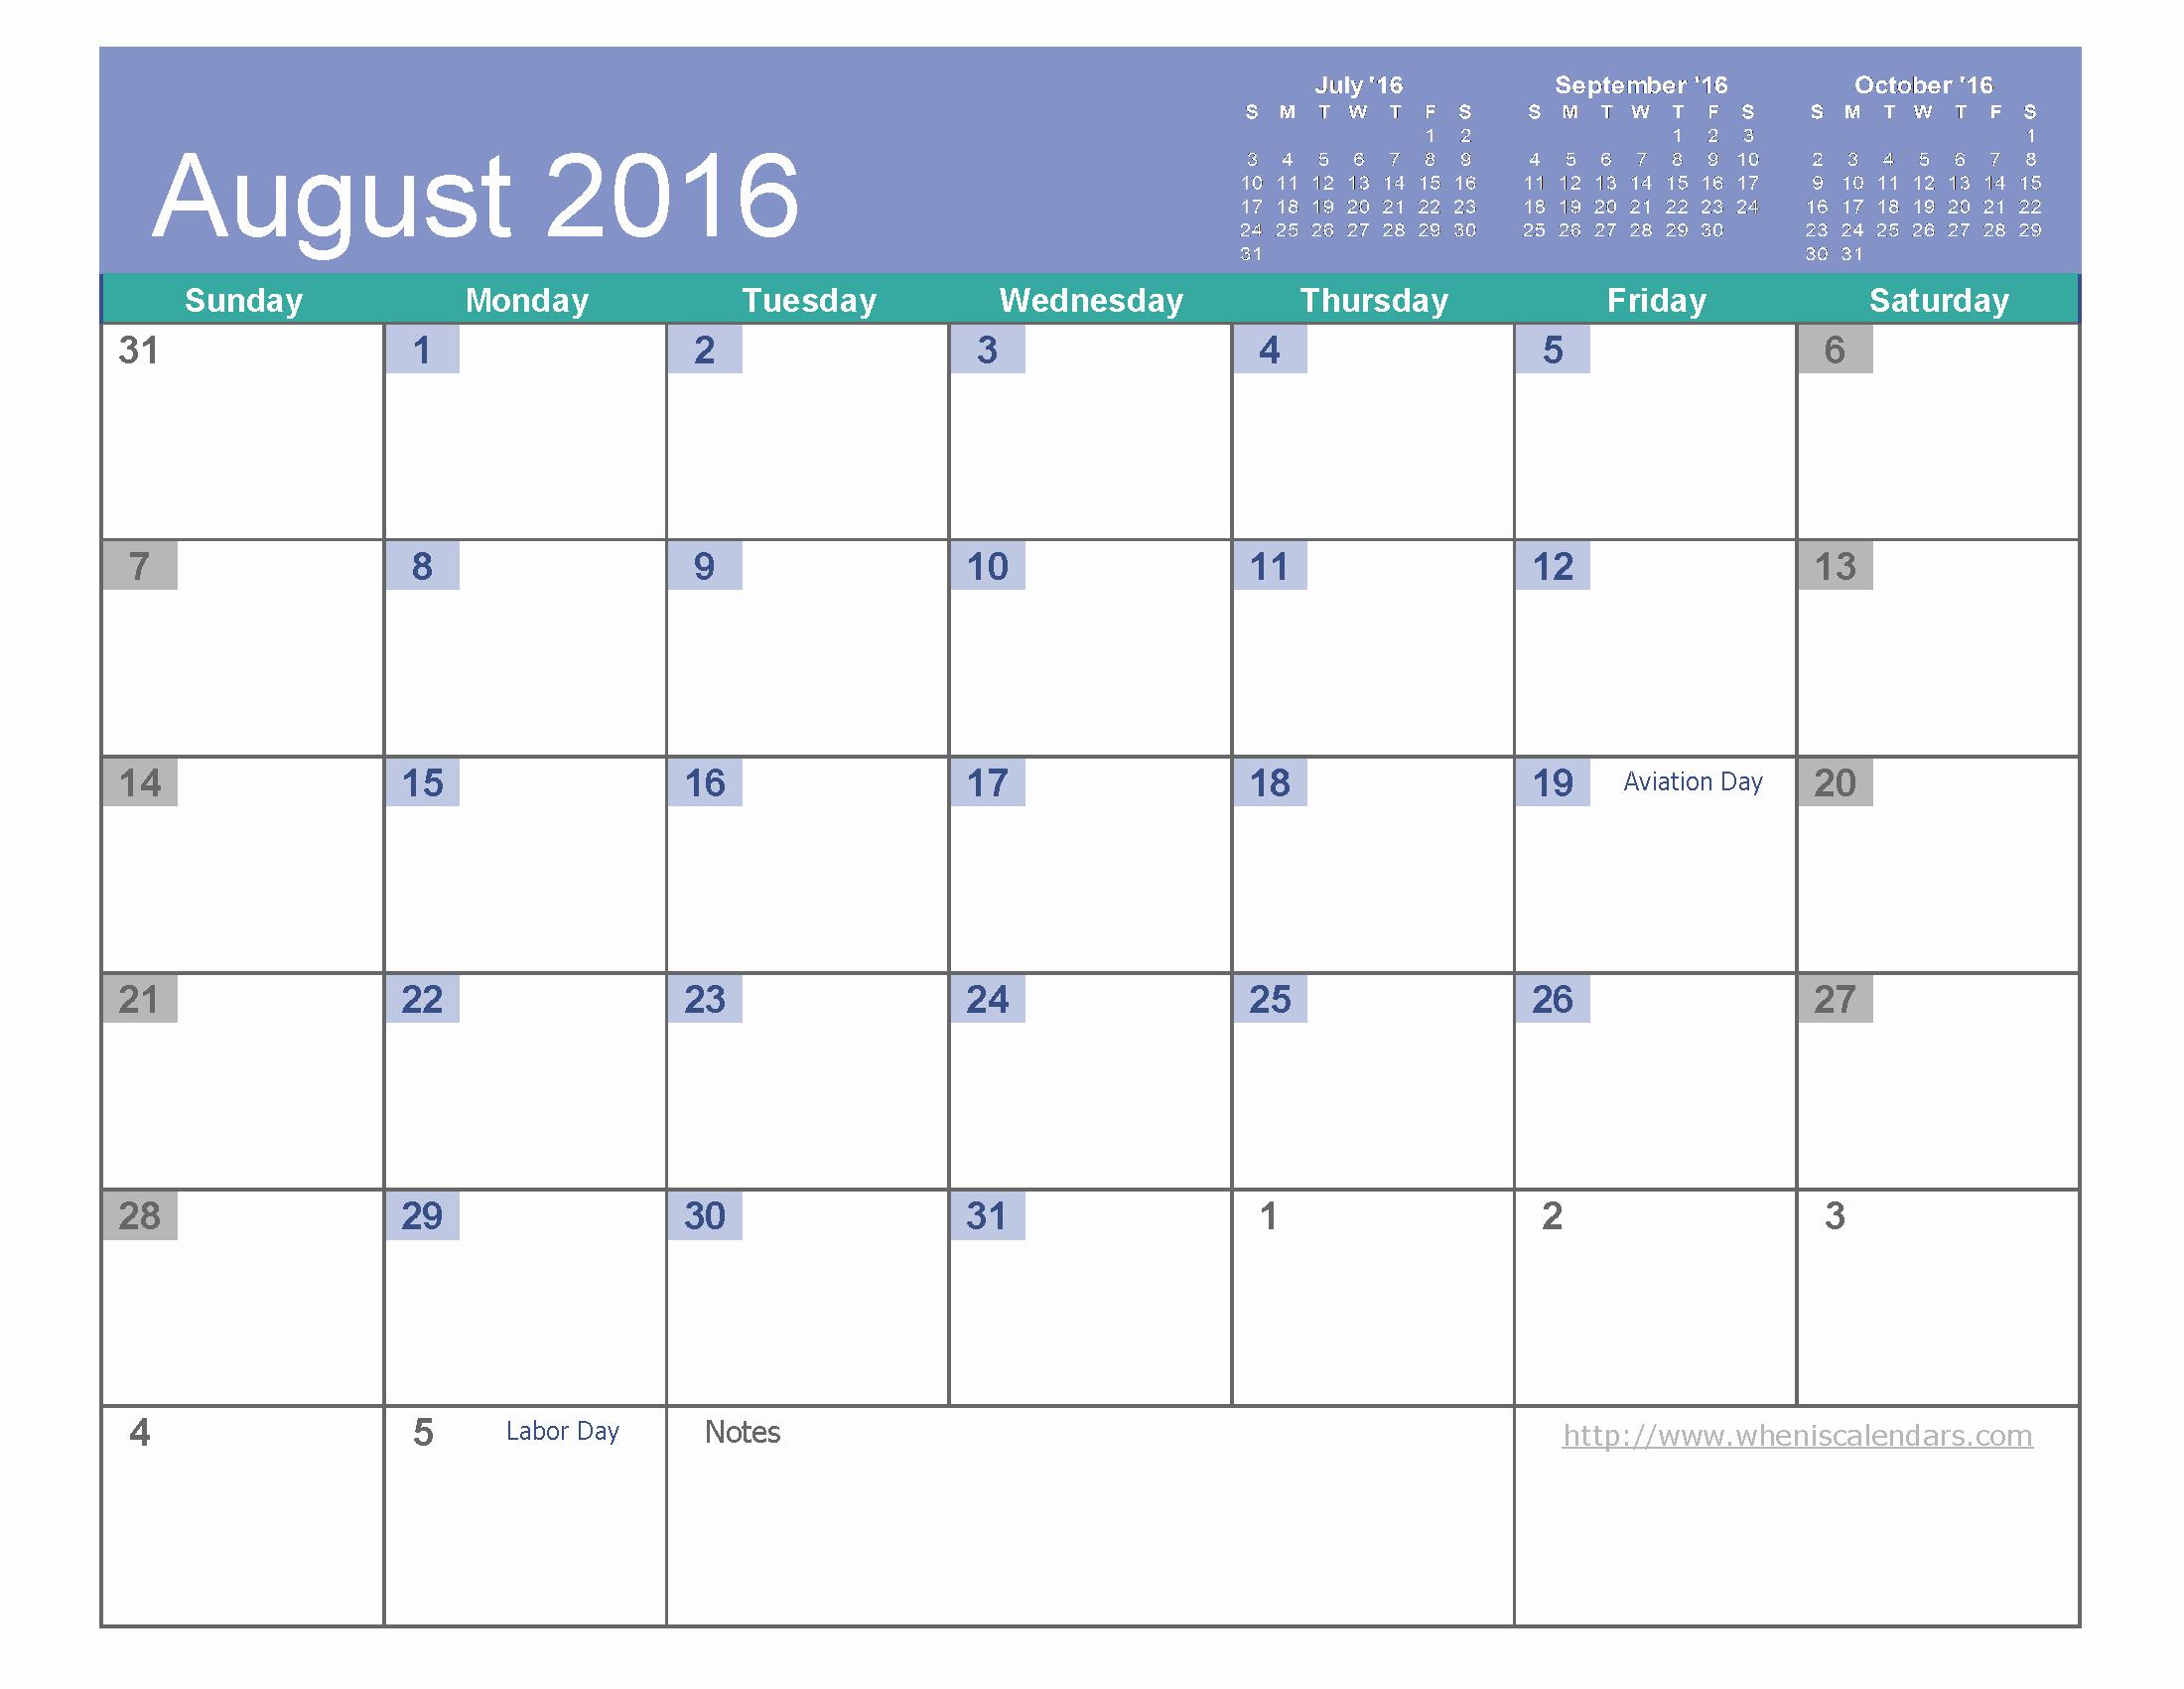 2016 Calendar Excel with Holidays Inspirational August 2016 Calendar Excel August2016 Excelcalendar